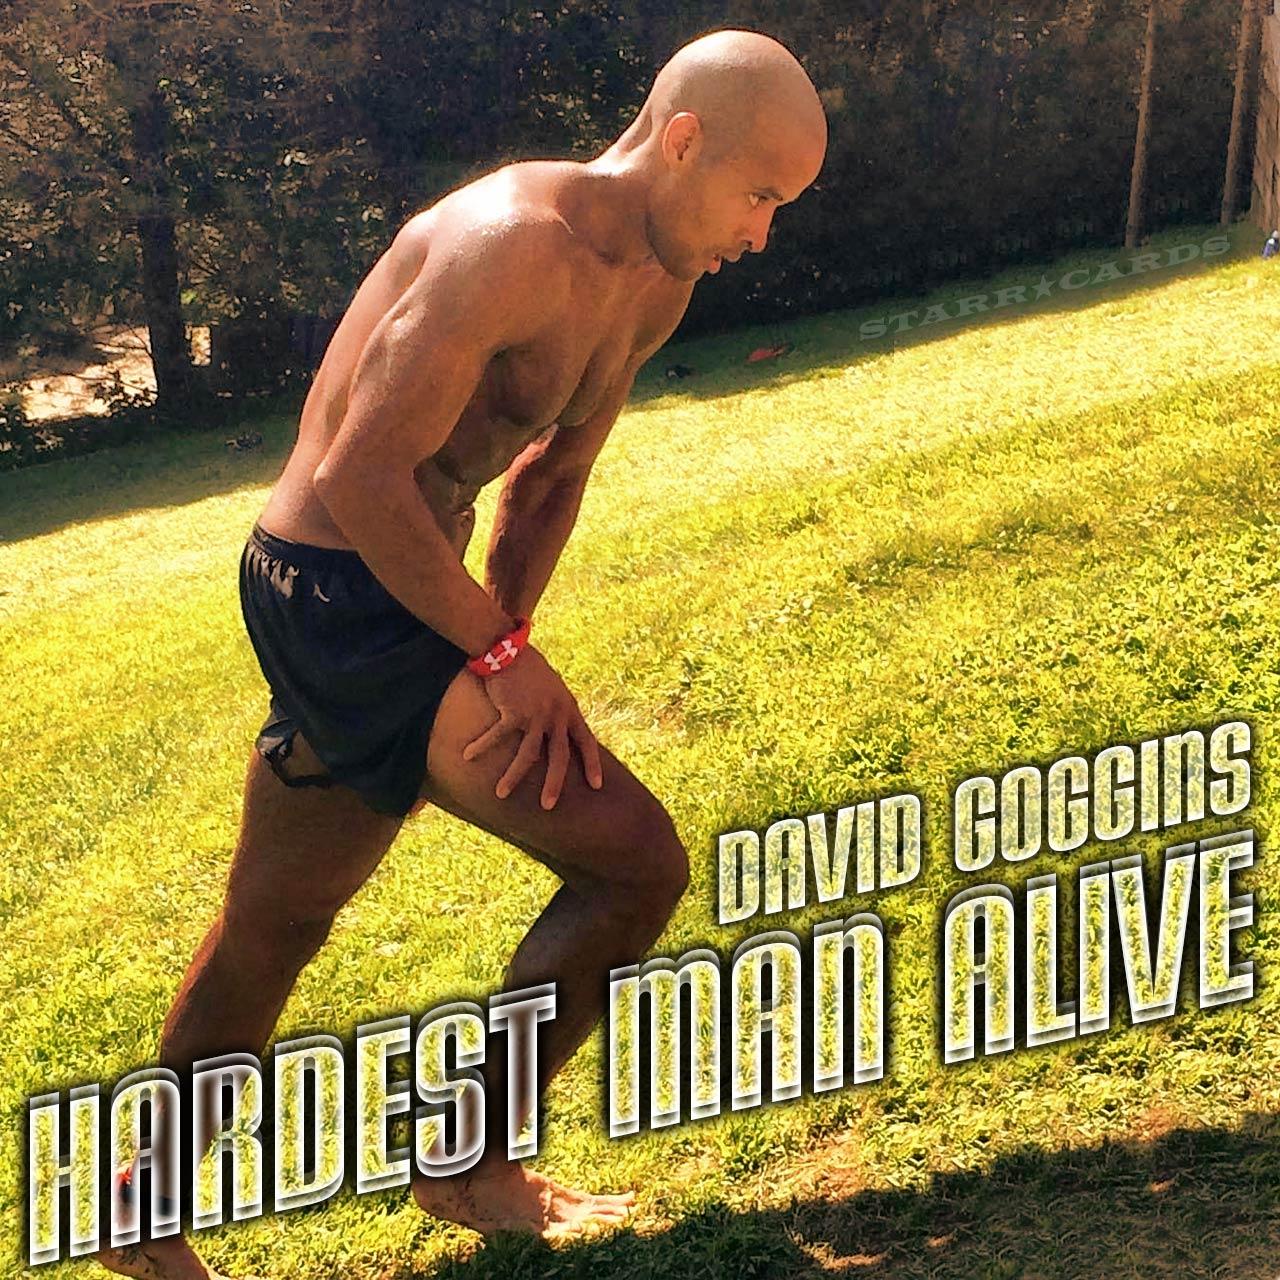 Monday Motivation: David Goggins embraces suffering to ...